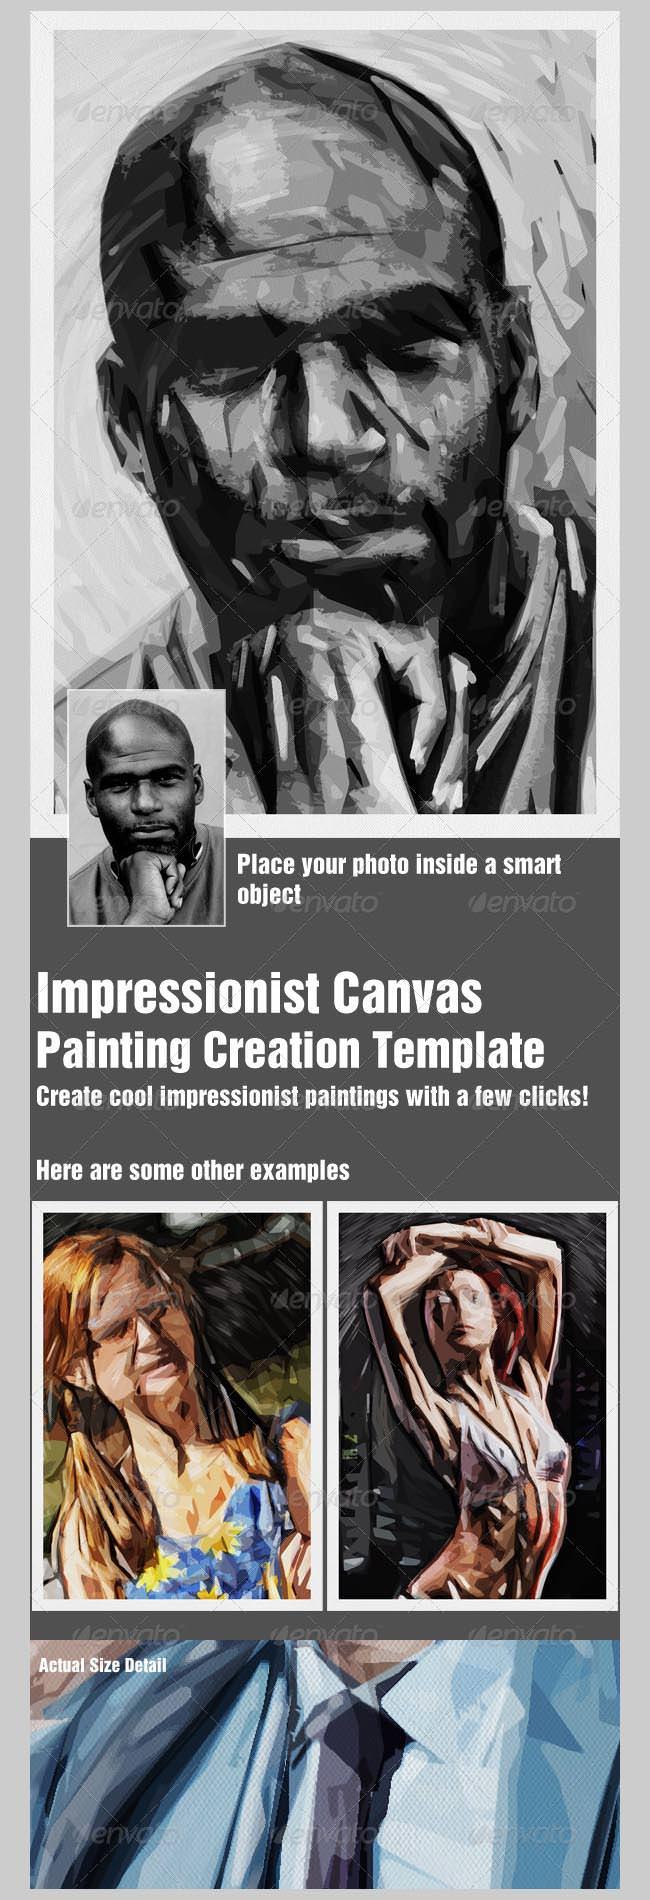 impressionist canvas